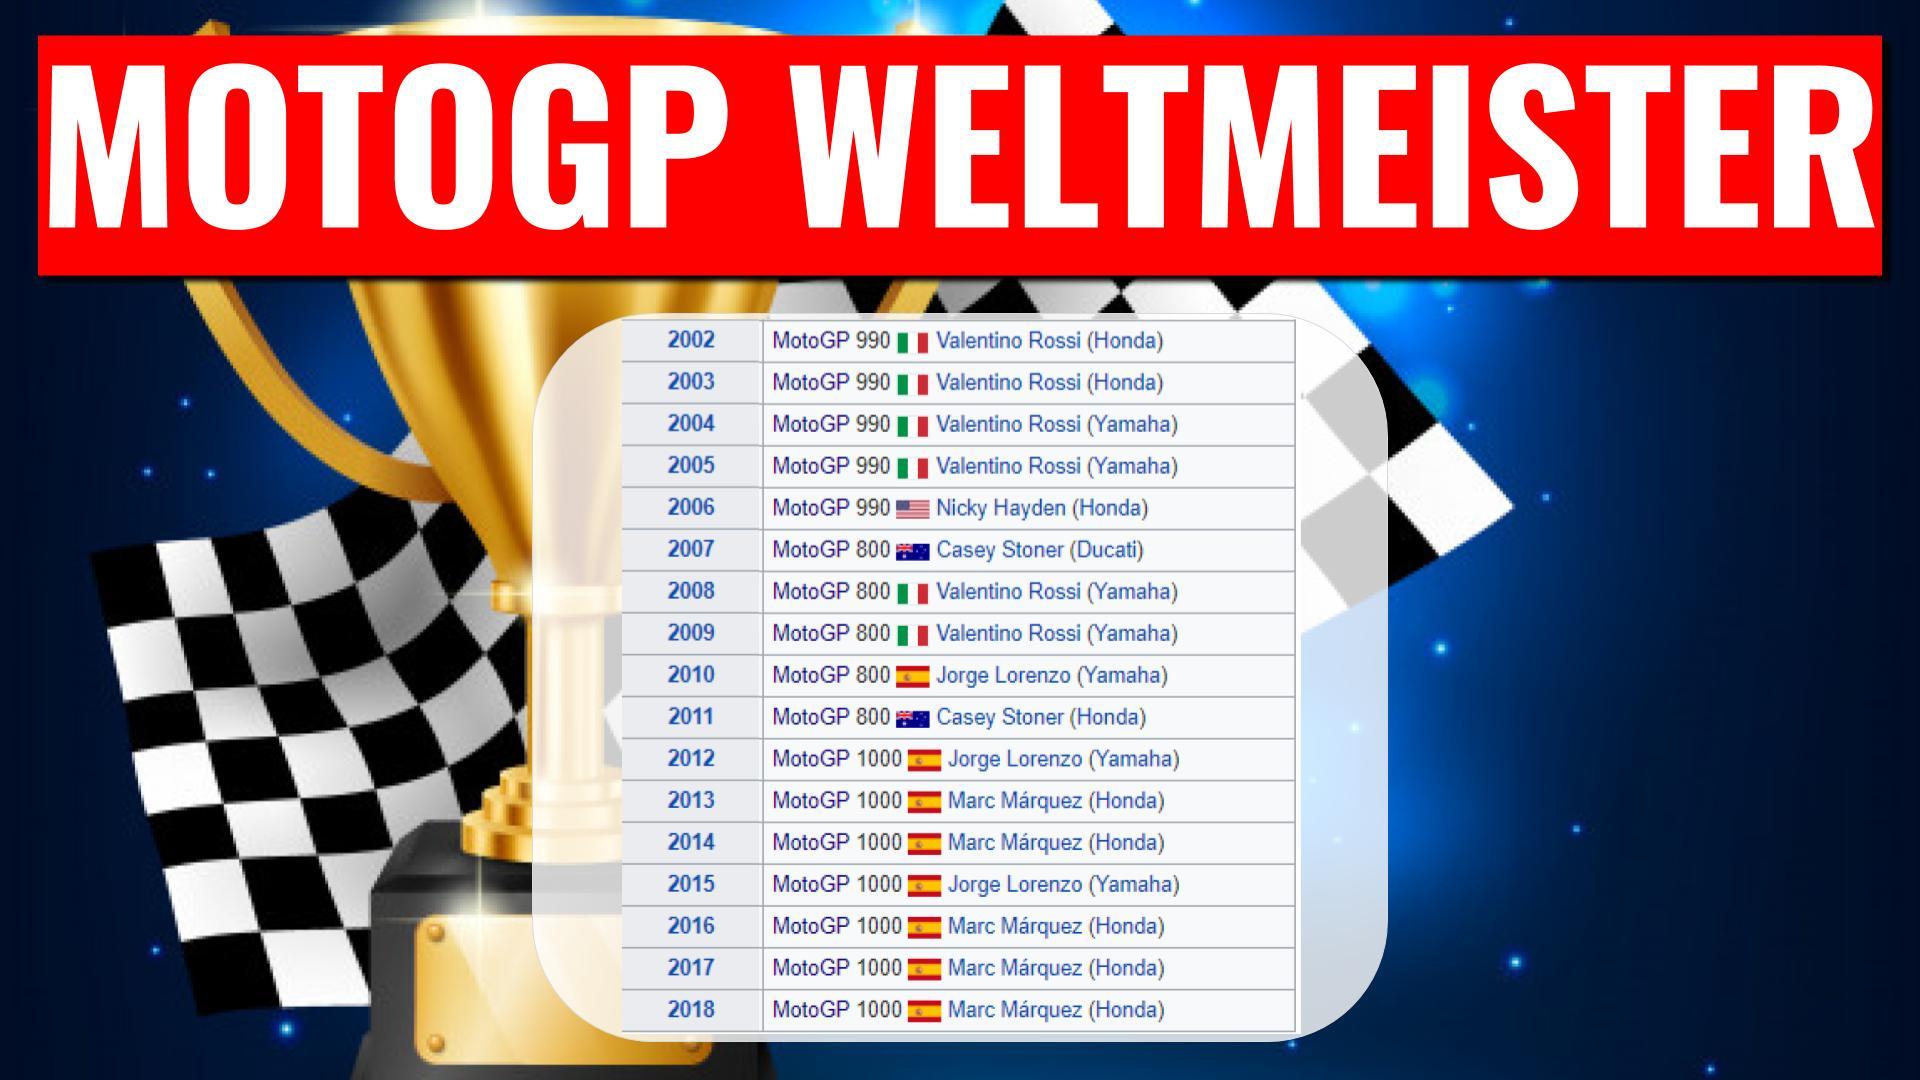 MotoGP Weltmeister seit 2002